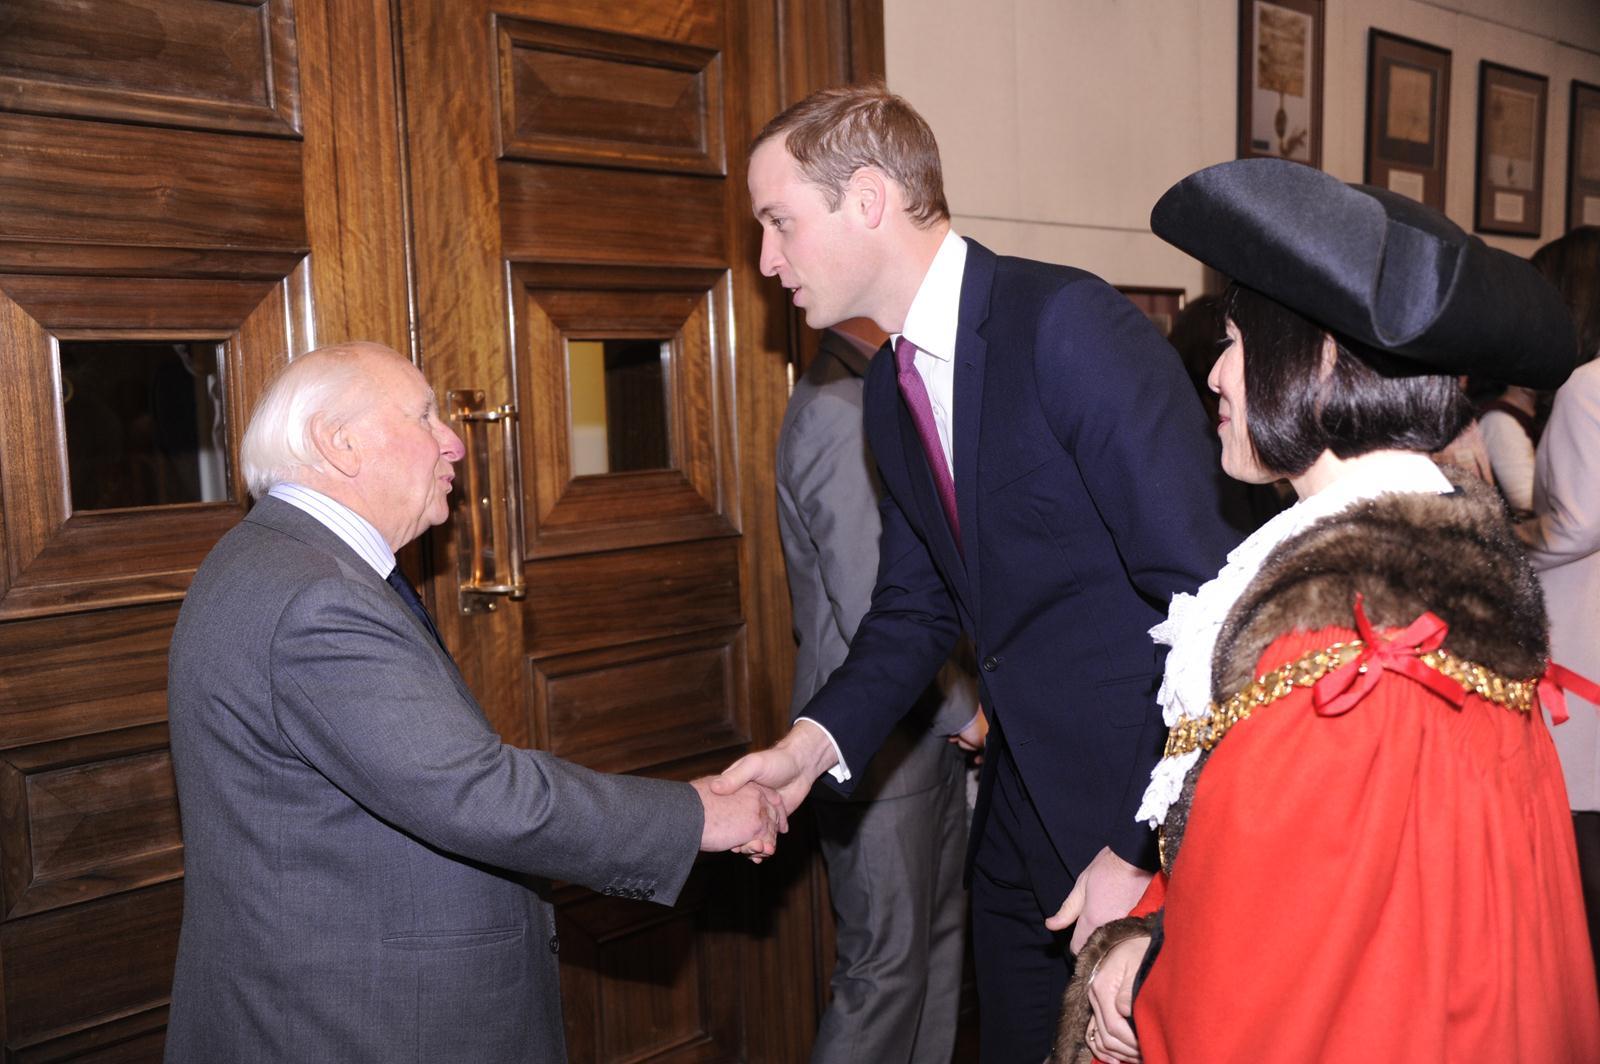 Prince-William-with-Dr-Neville-Silverston.jpg